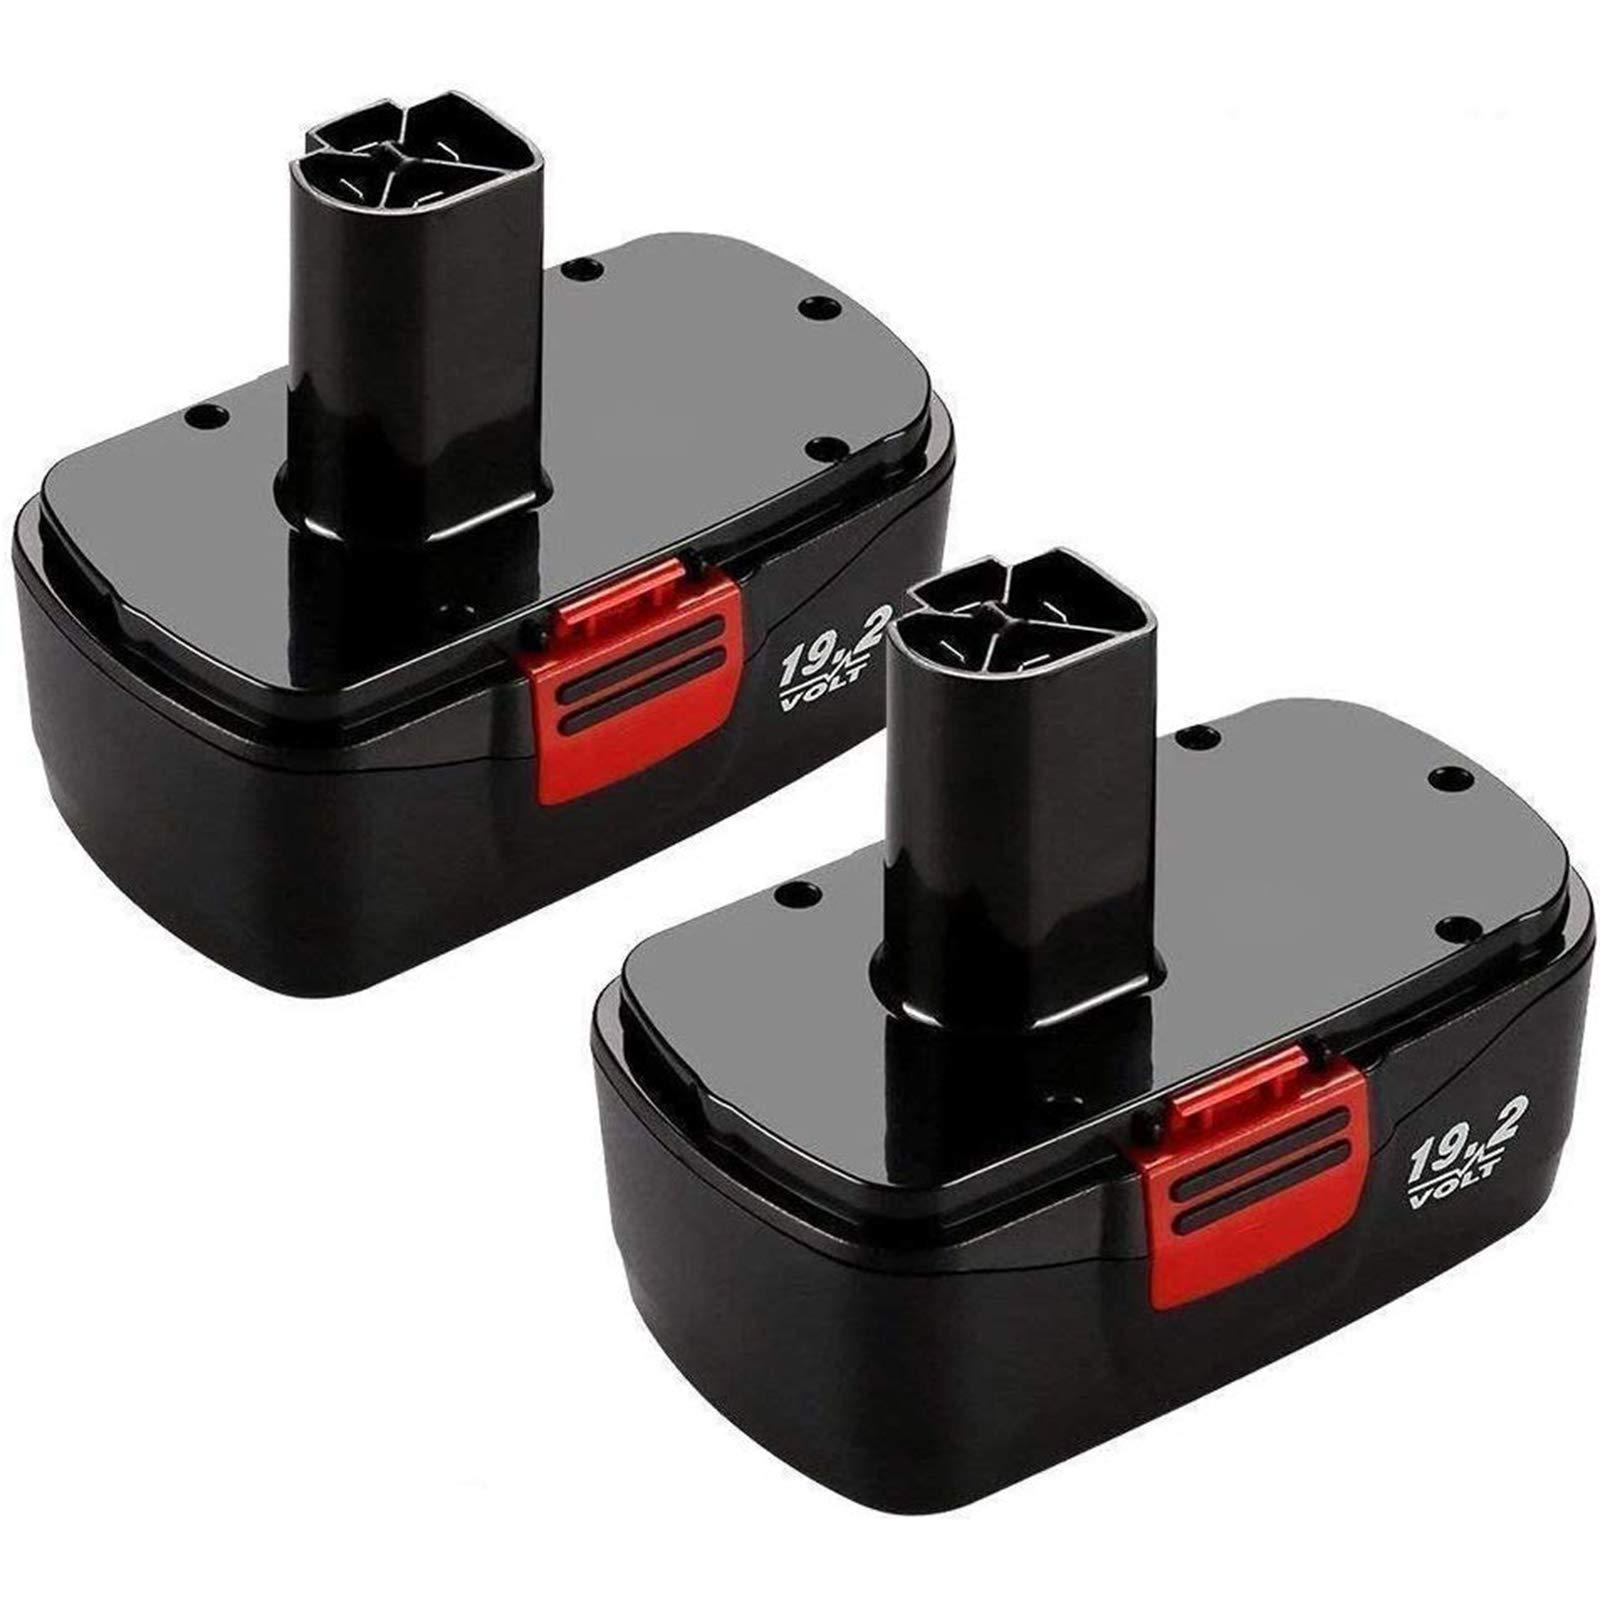 2Packs 19.2 Volt 3.6Ah Battery for Craftsman C3 DieHard 130279005 130279003 130279017 315.113753 315.115410 315.11485 1323903 1323517 11375 11376 Cordless Drill Tool